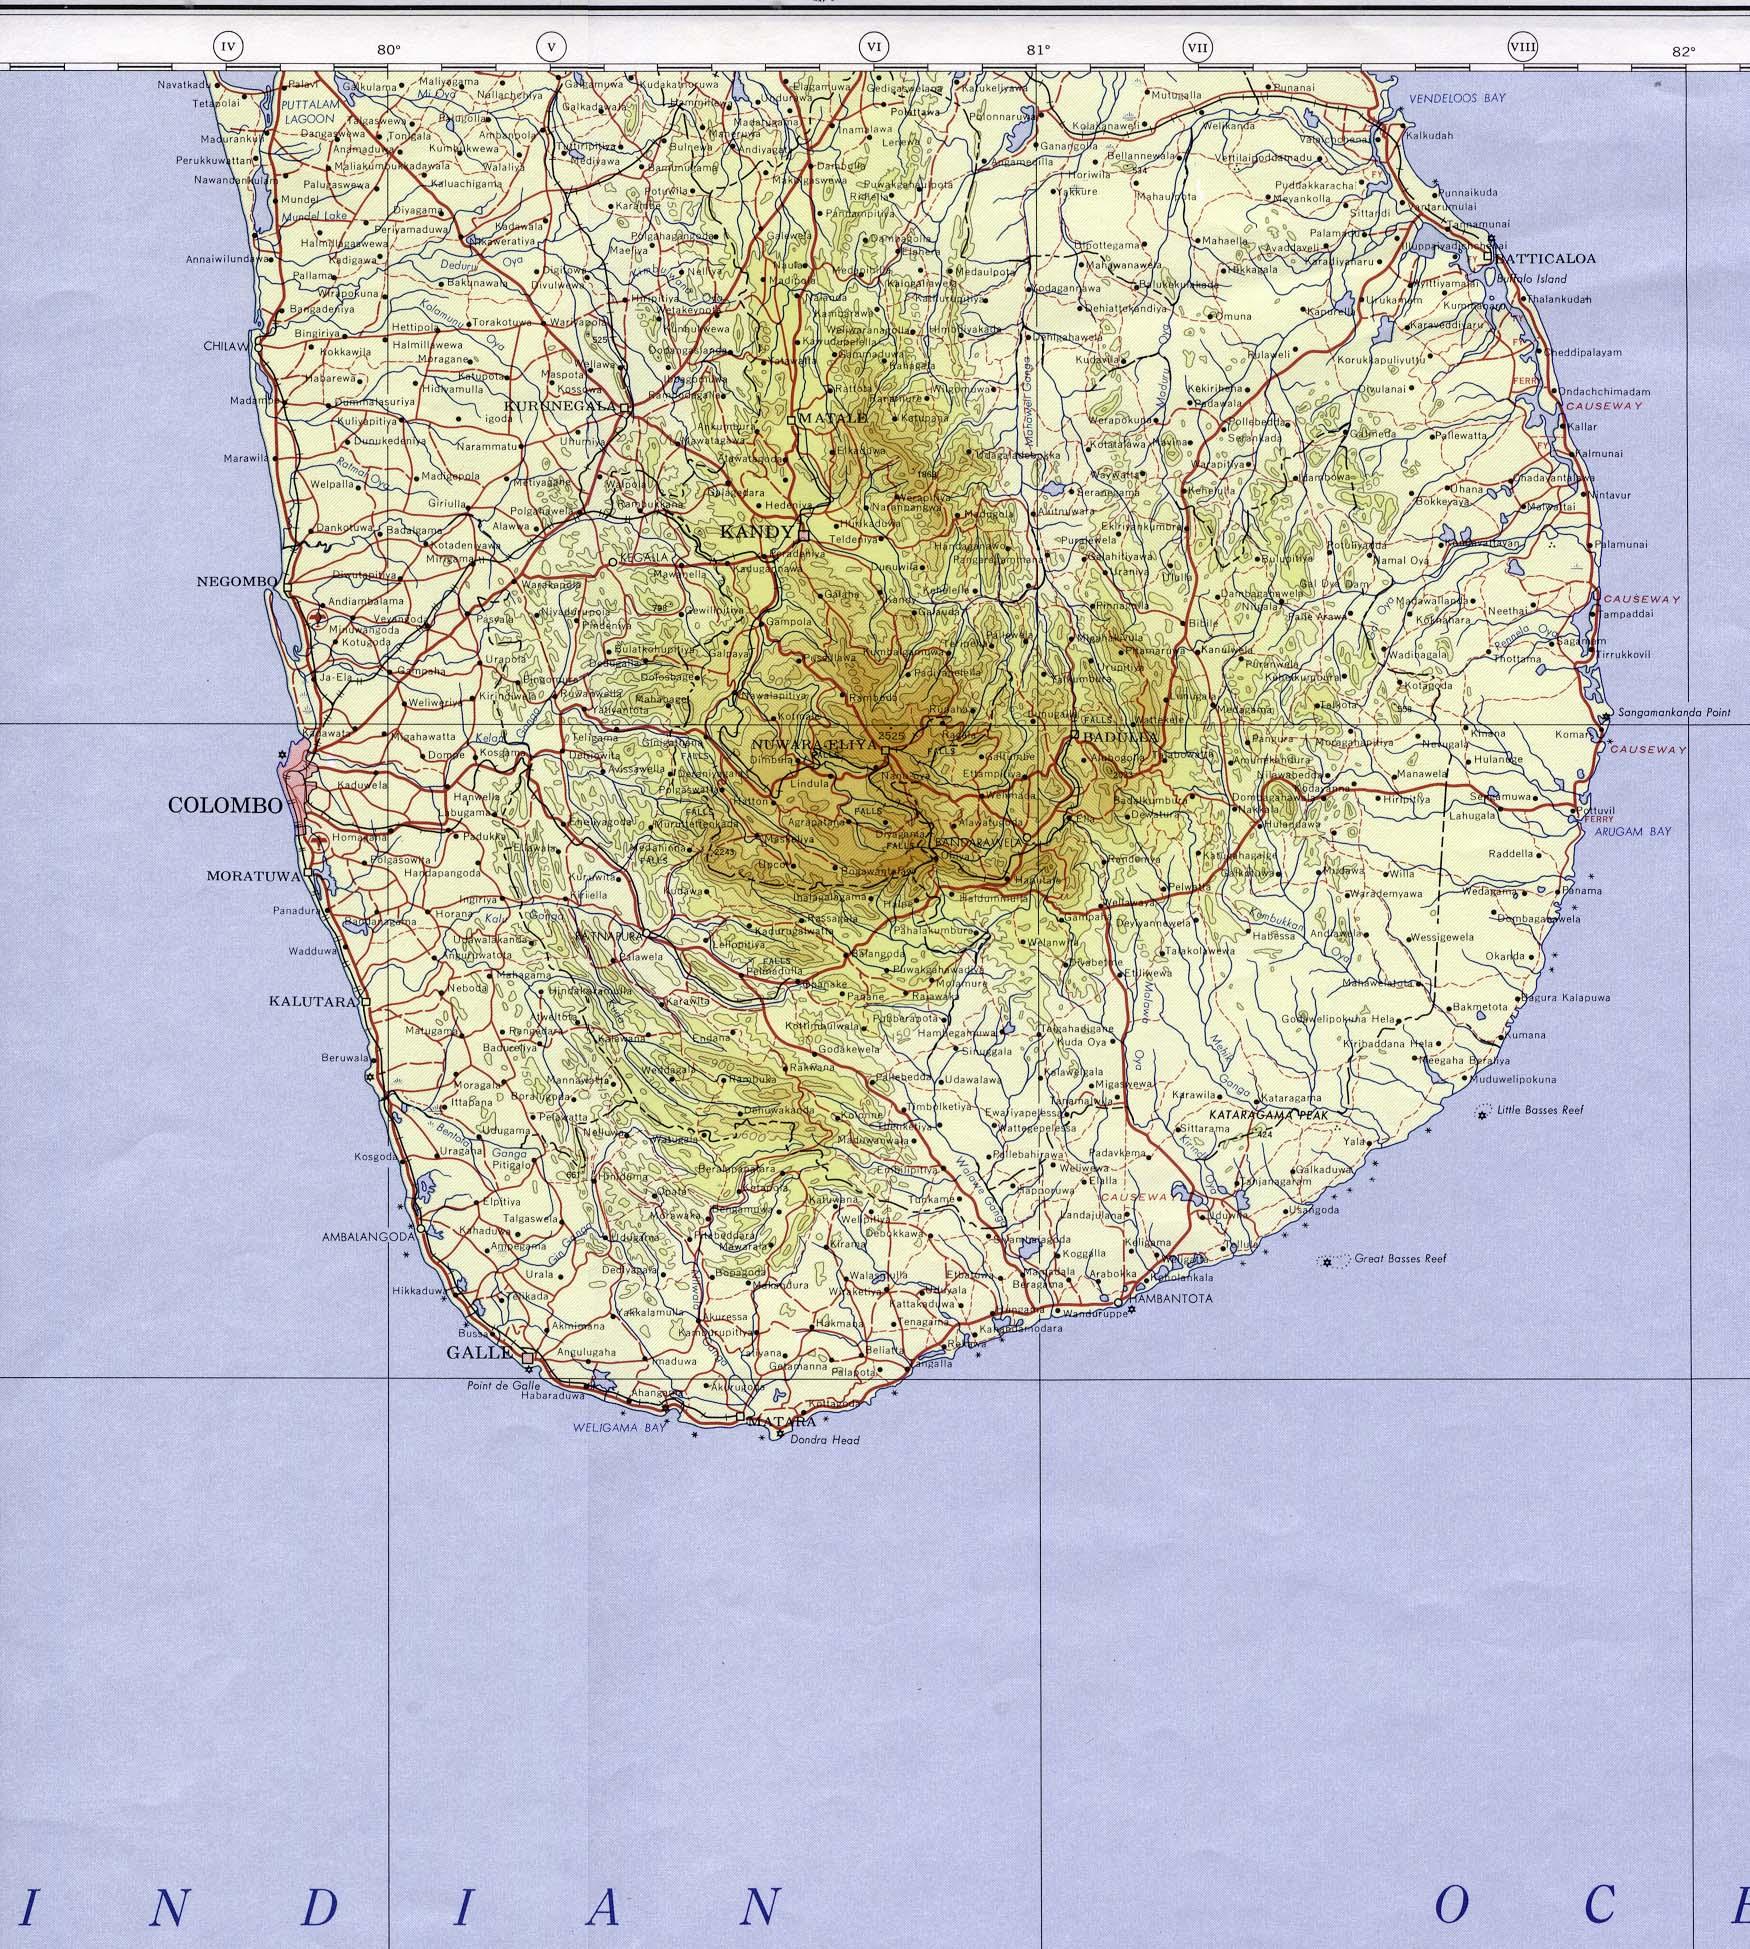 Southern Ceylon (Sri Lanka) Topographic Map 1964